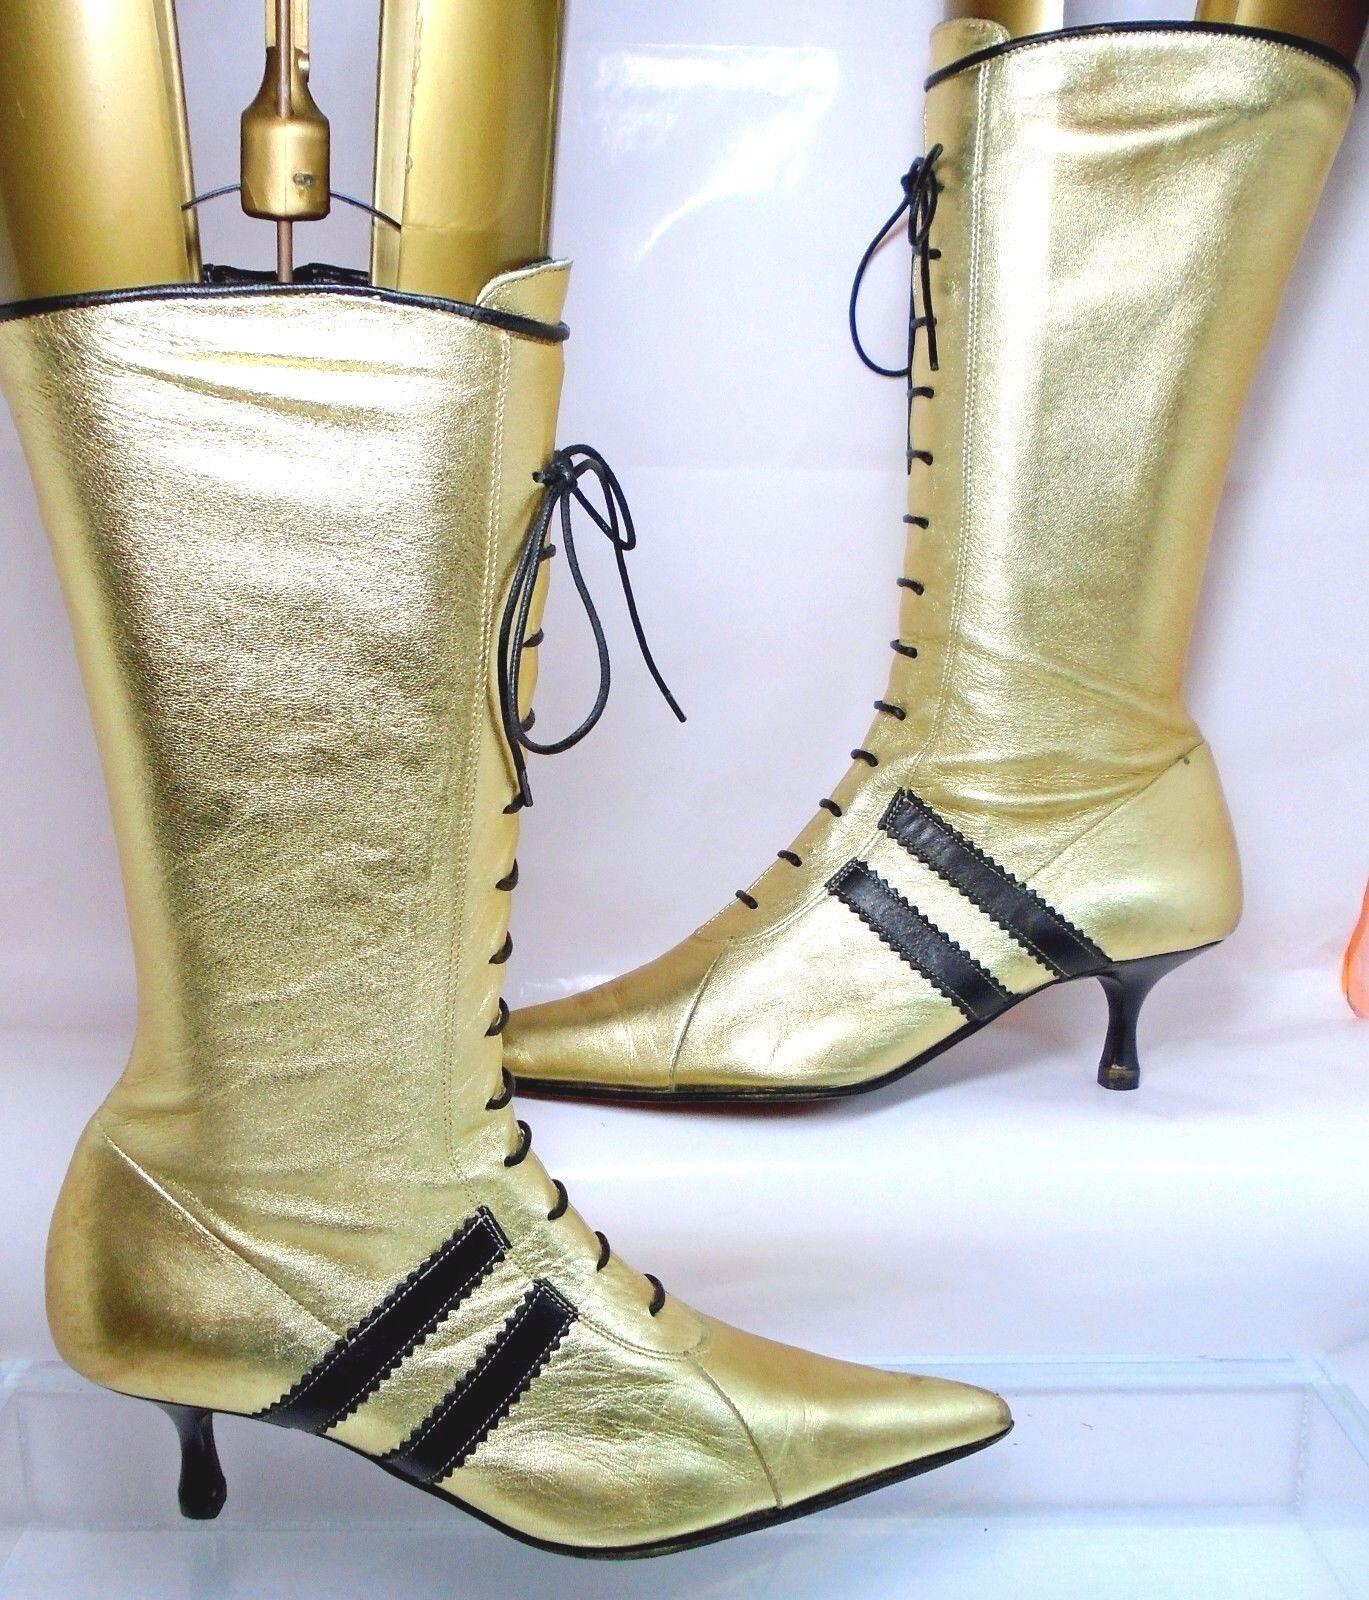 CAMMINA  Pointy Toe Zip Up Mid Calf Boots Kitten Heel Gold Leather US 5